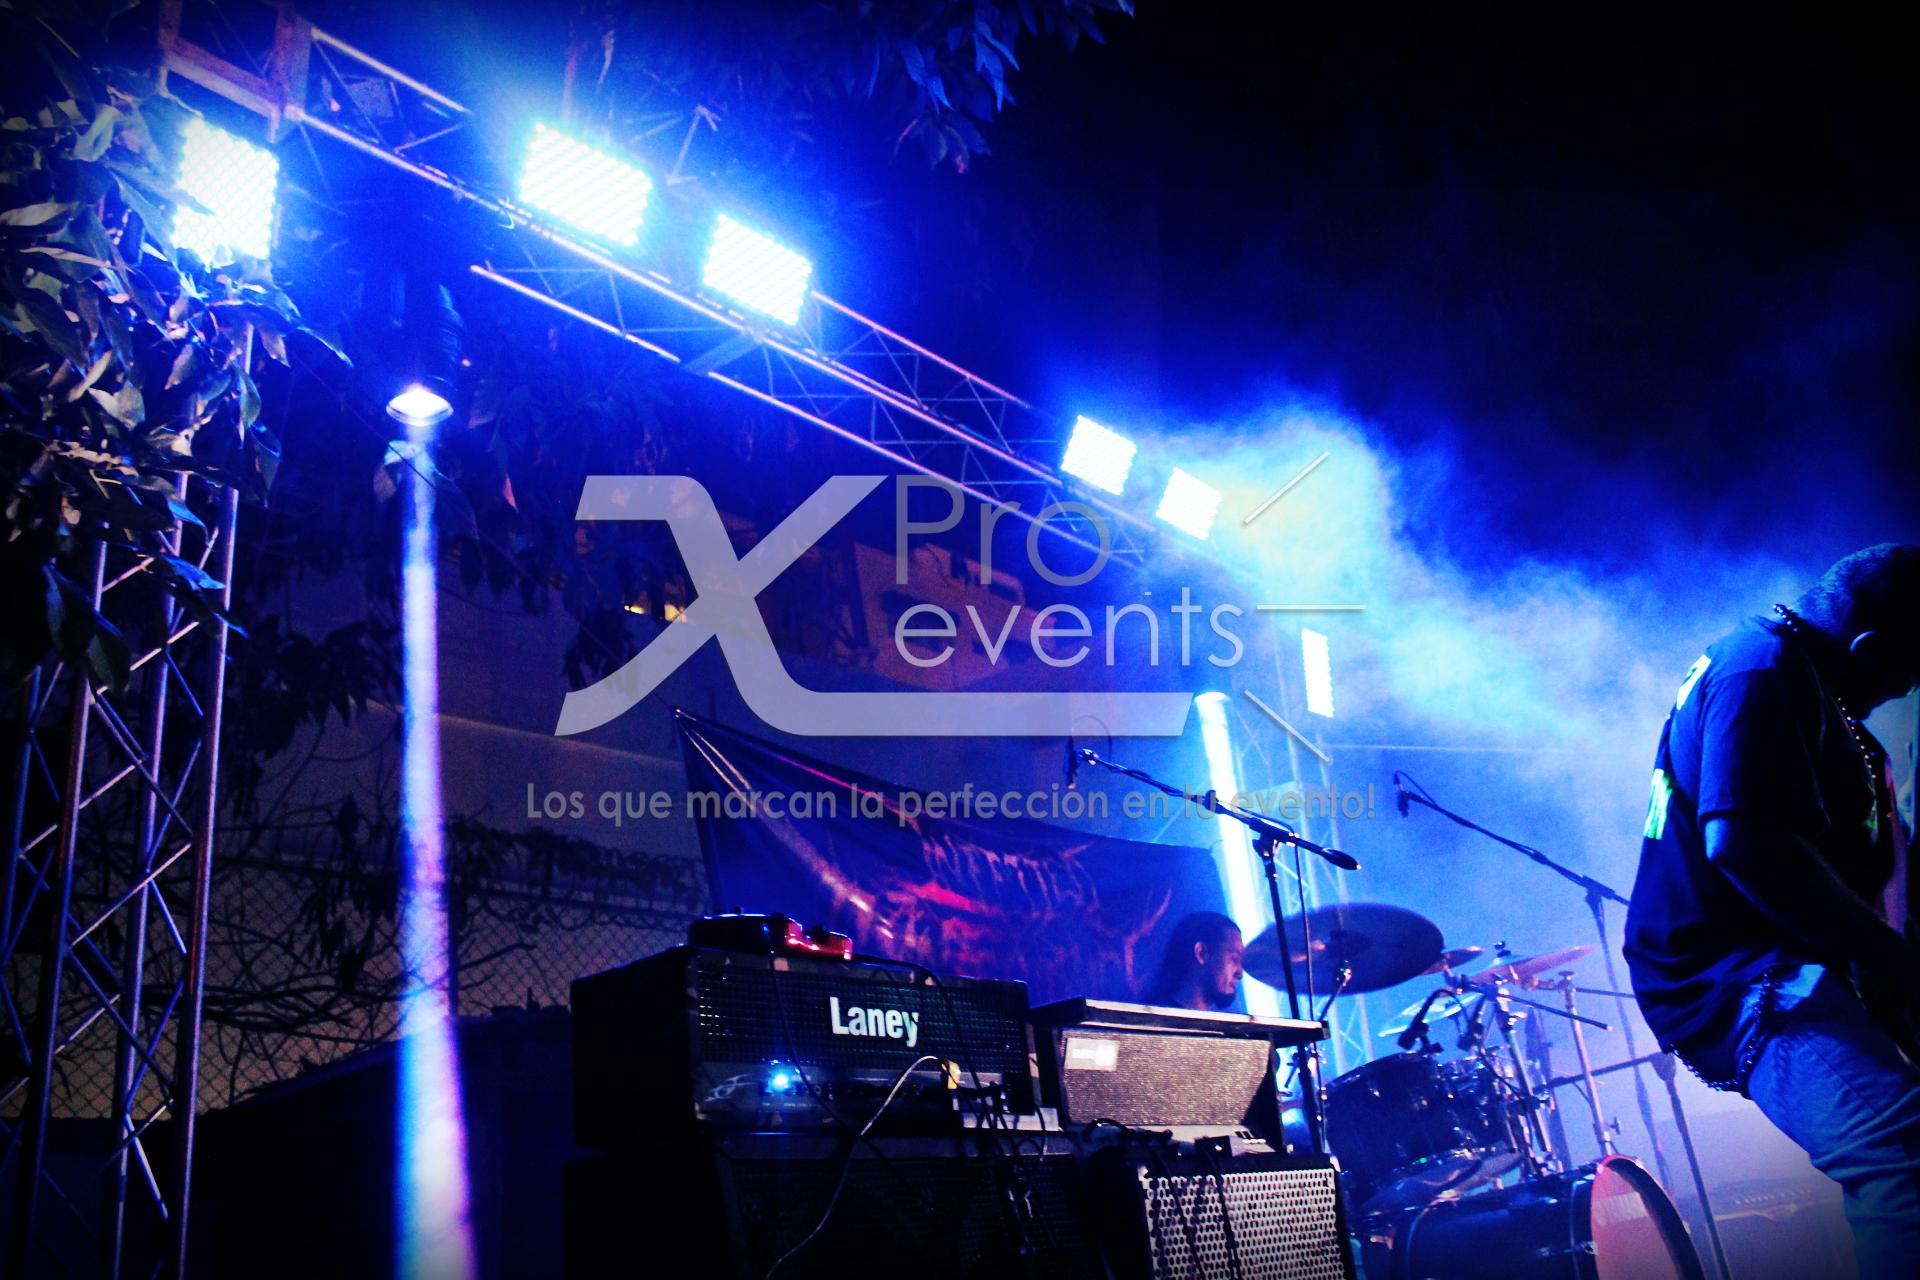 www.Xproevents.com - Impactantes montajes para shows en tarimas.JPG